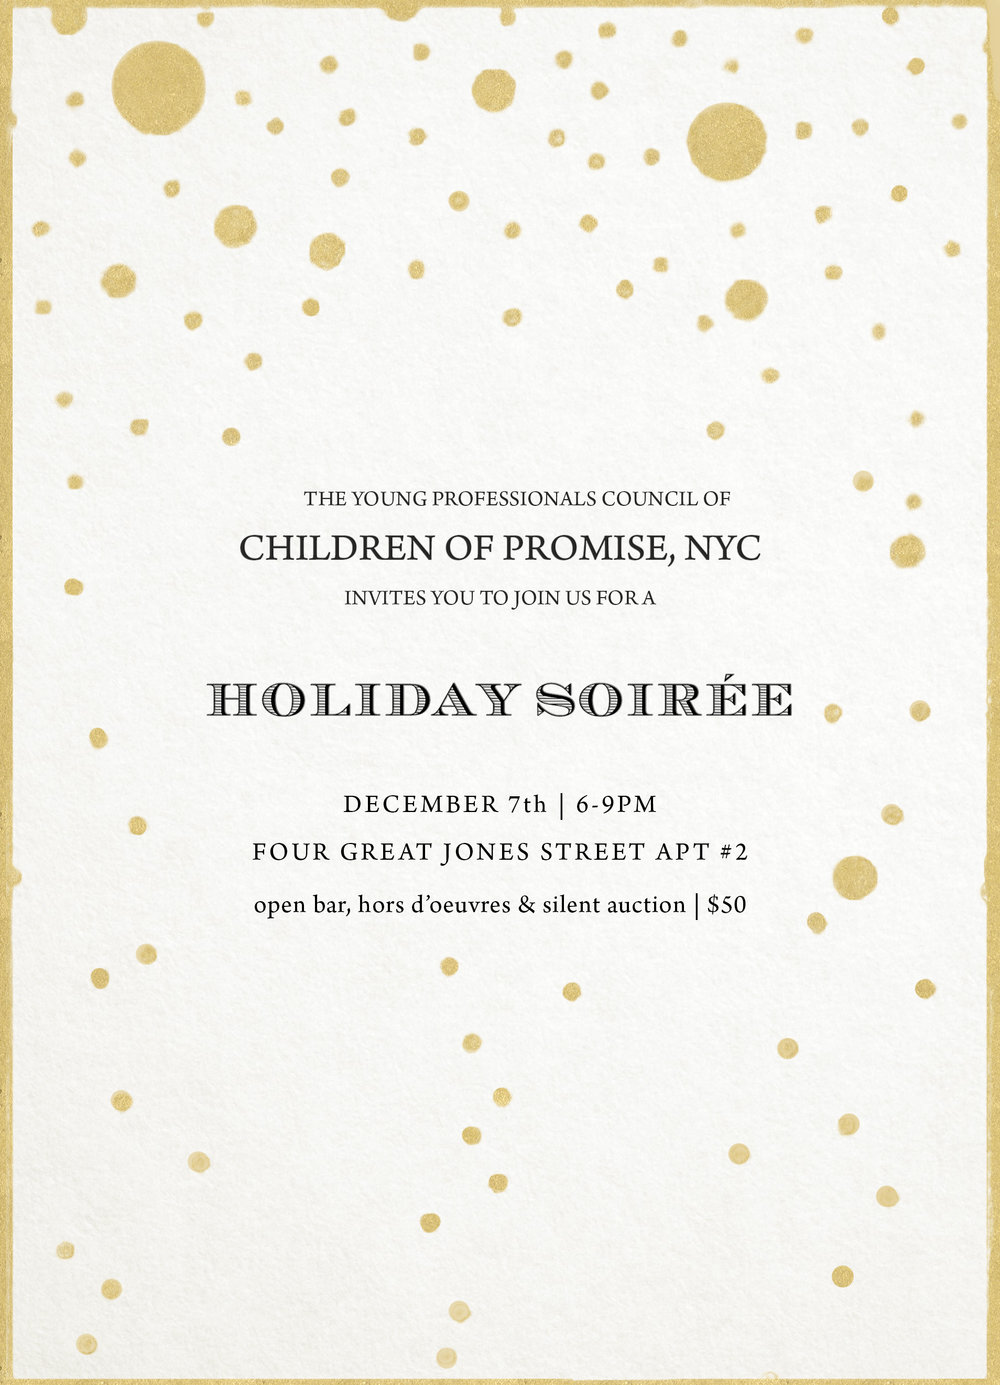 Holiday Soiree Invite.jpg